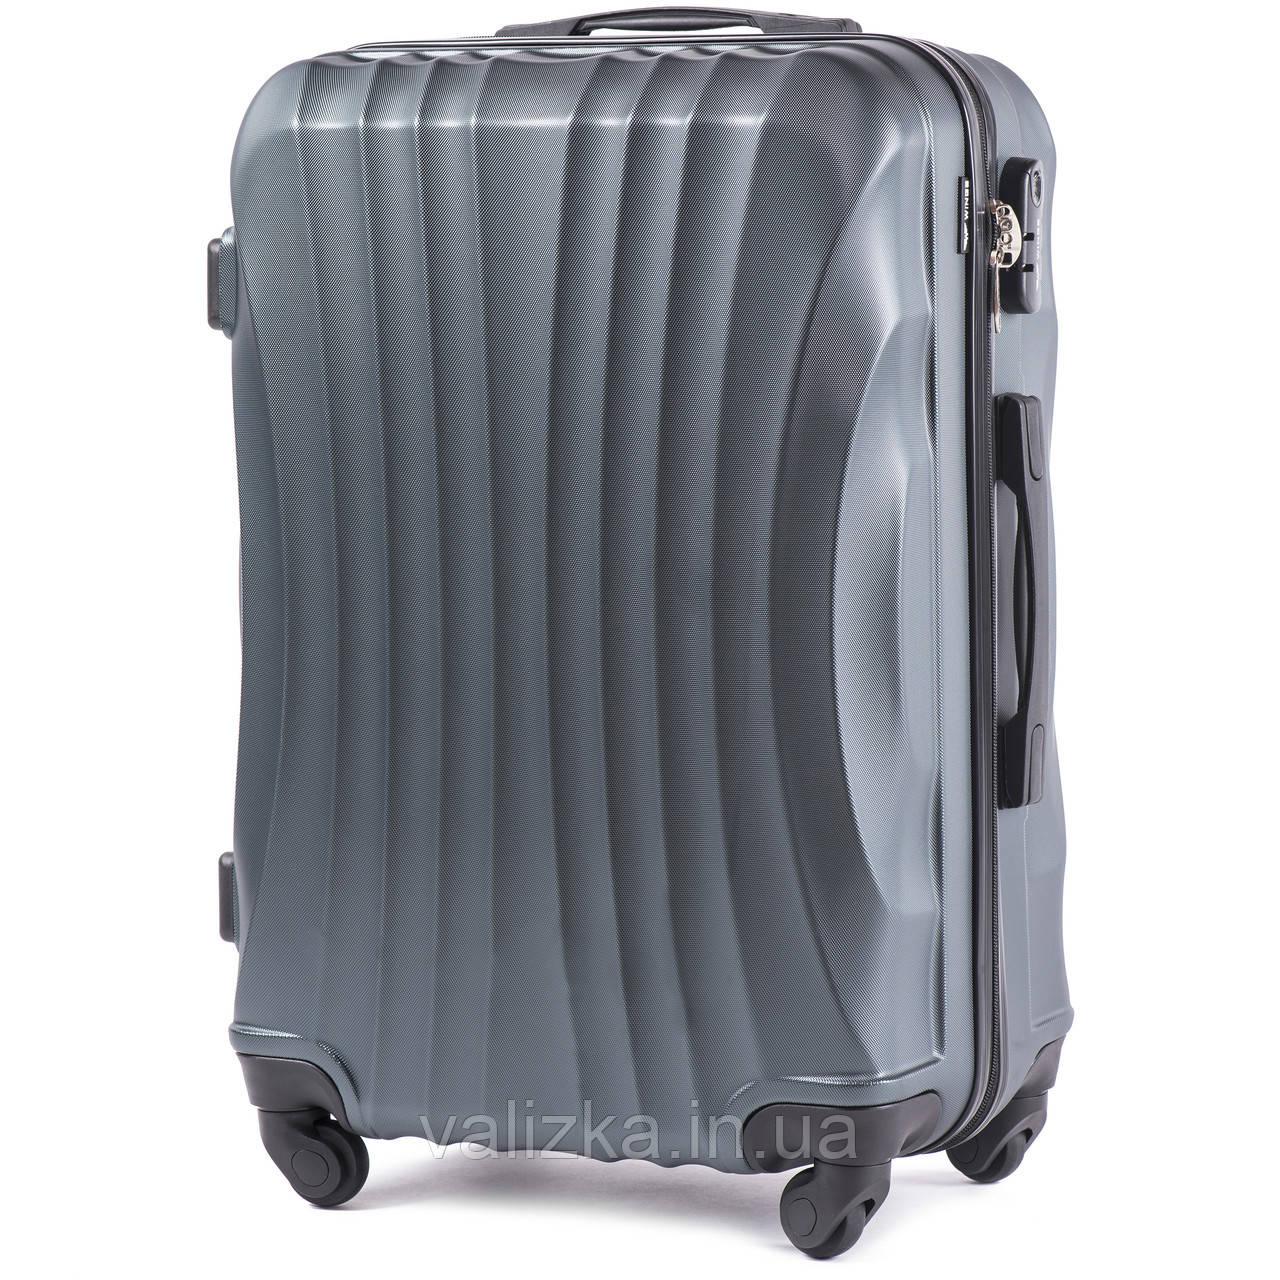 Большой чемодан из поликарбоната Wings 159  темно-зеленый на 4-х колесах